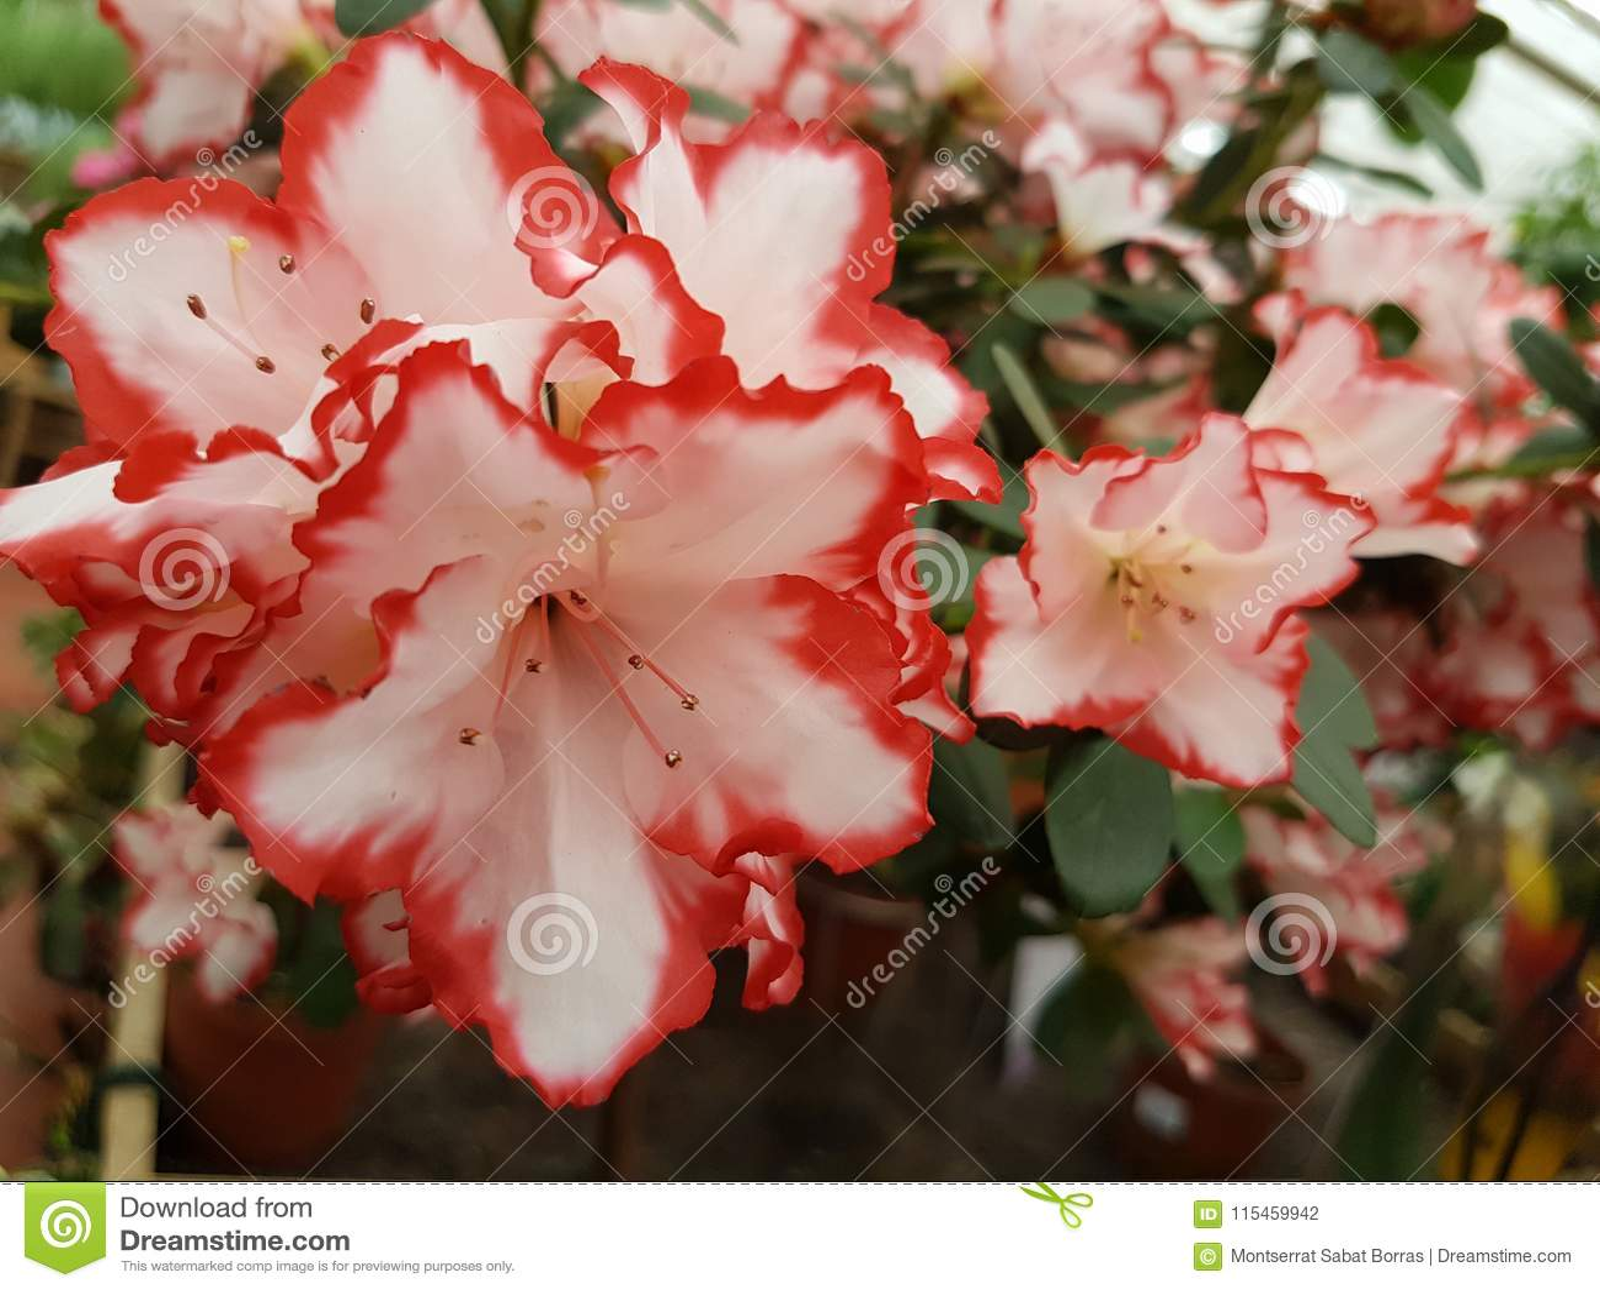 White Azalea Flower With Pink Edges Stock Photo Image Of Flowers